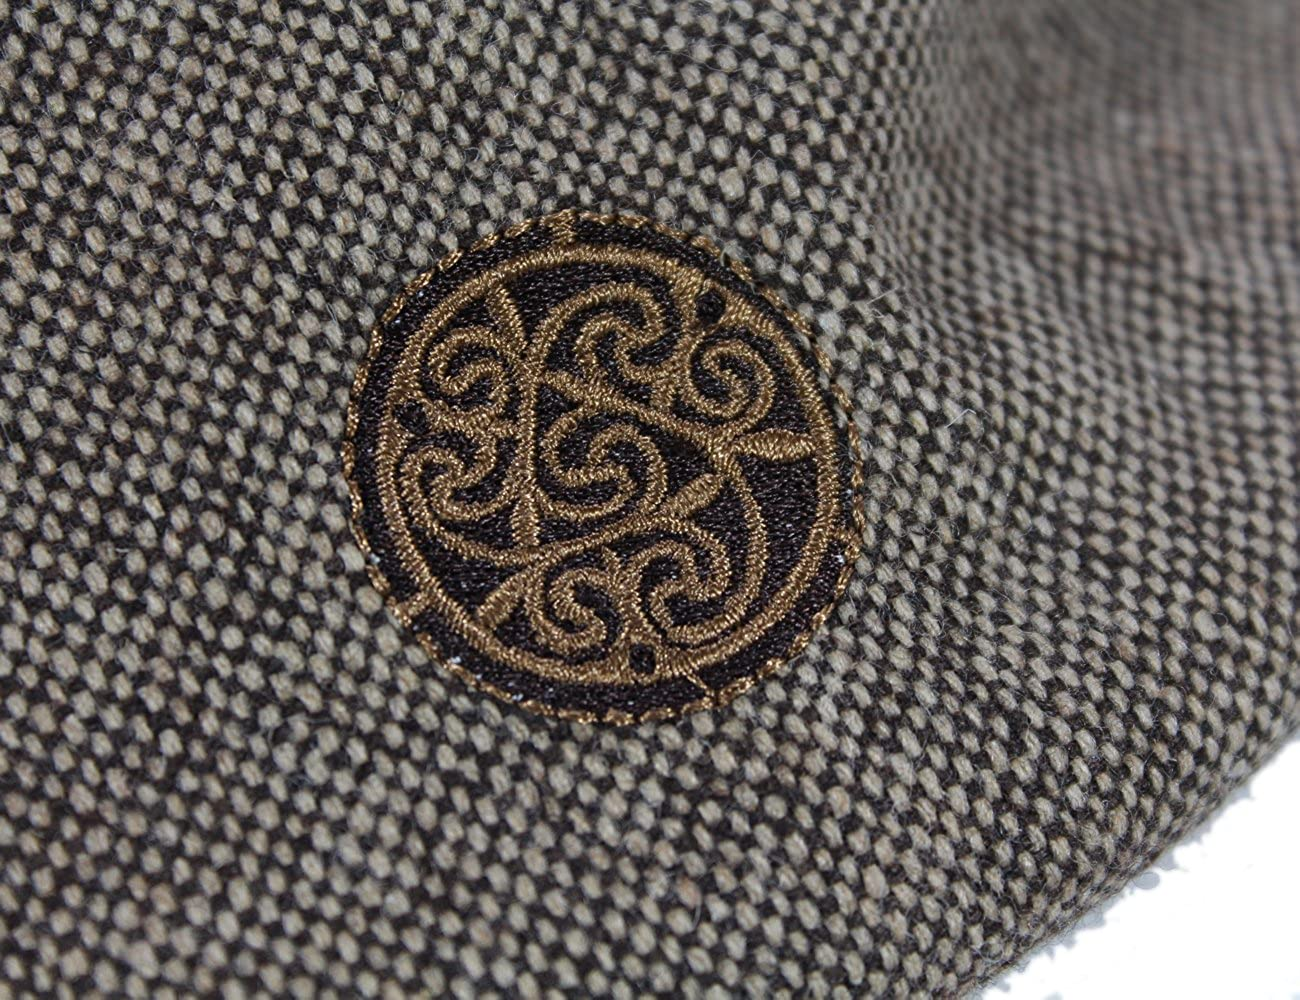 Patrick Francis Patchwork Tweed Flat Cap Celtic Knot Badge